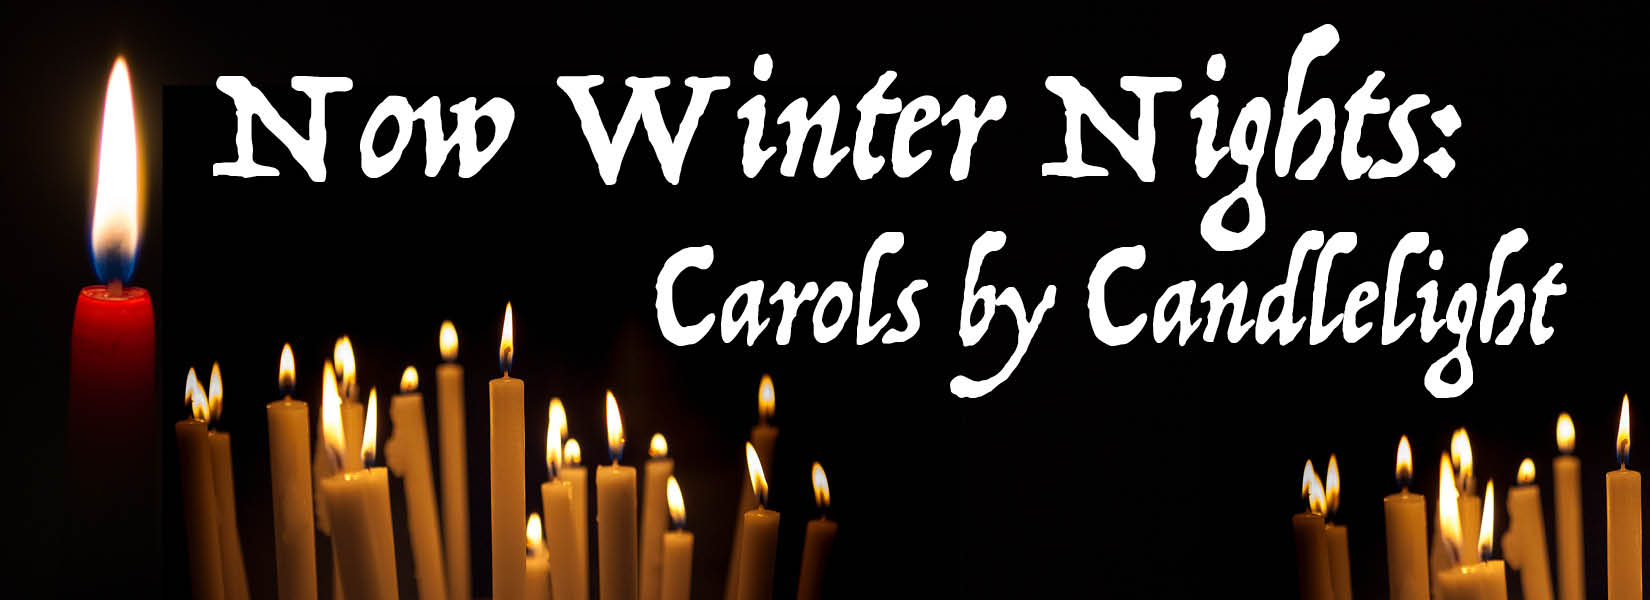 Carols by Candlelight